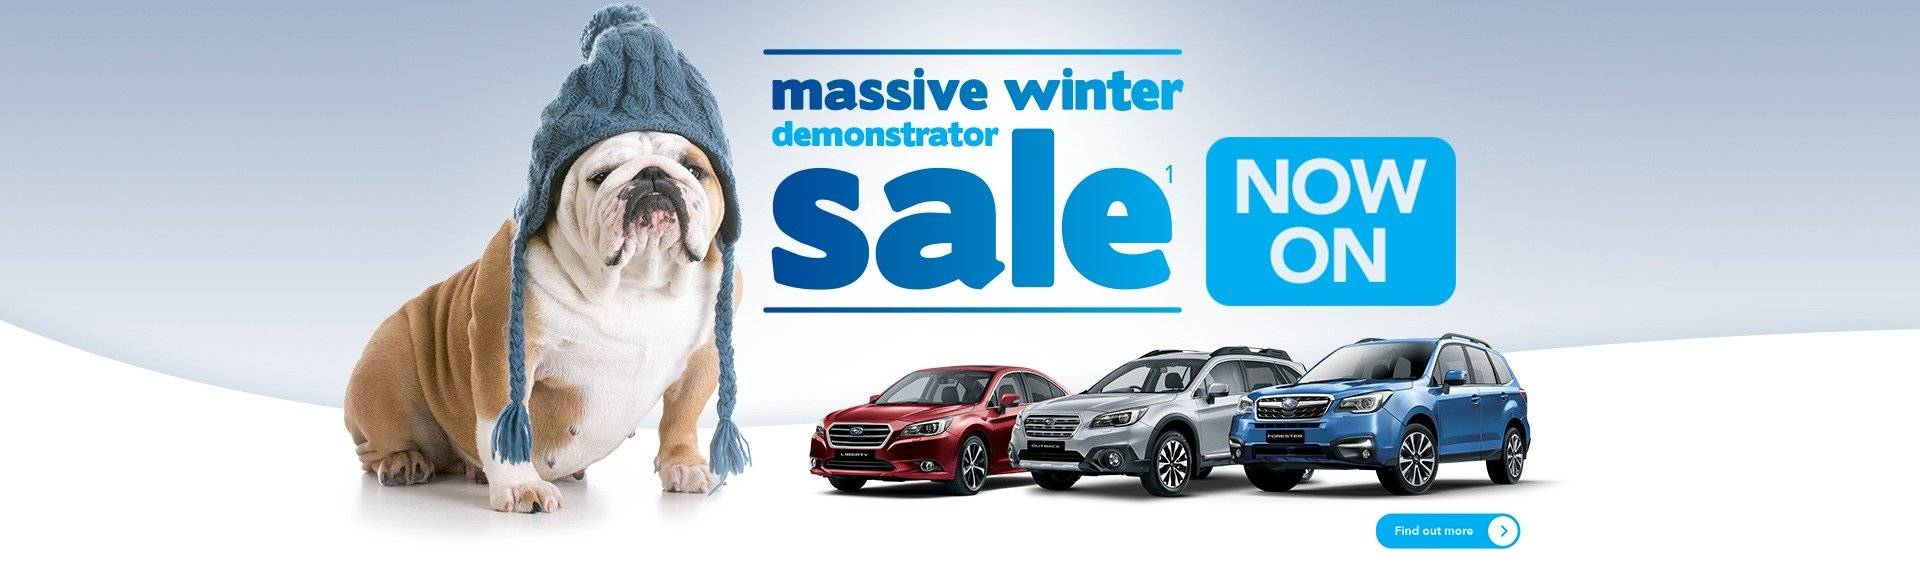 Winter Demonstrator Sale